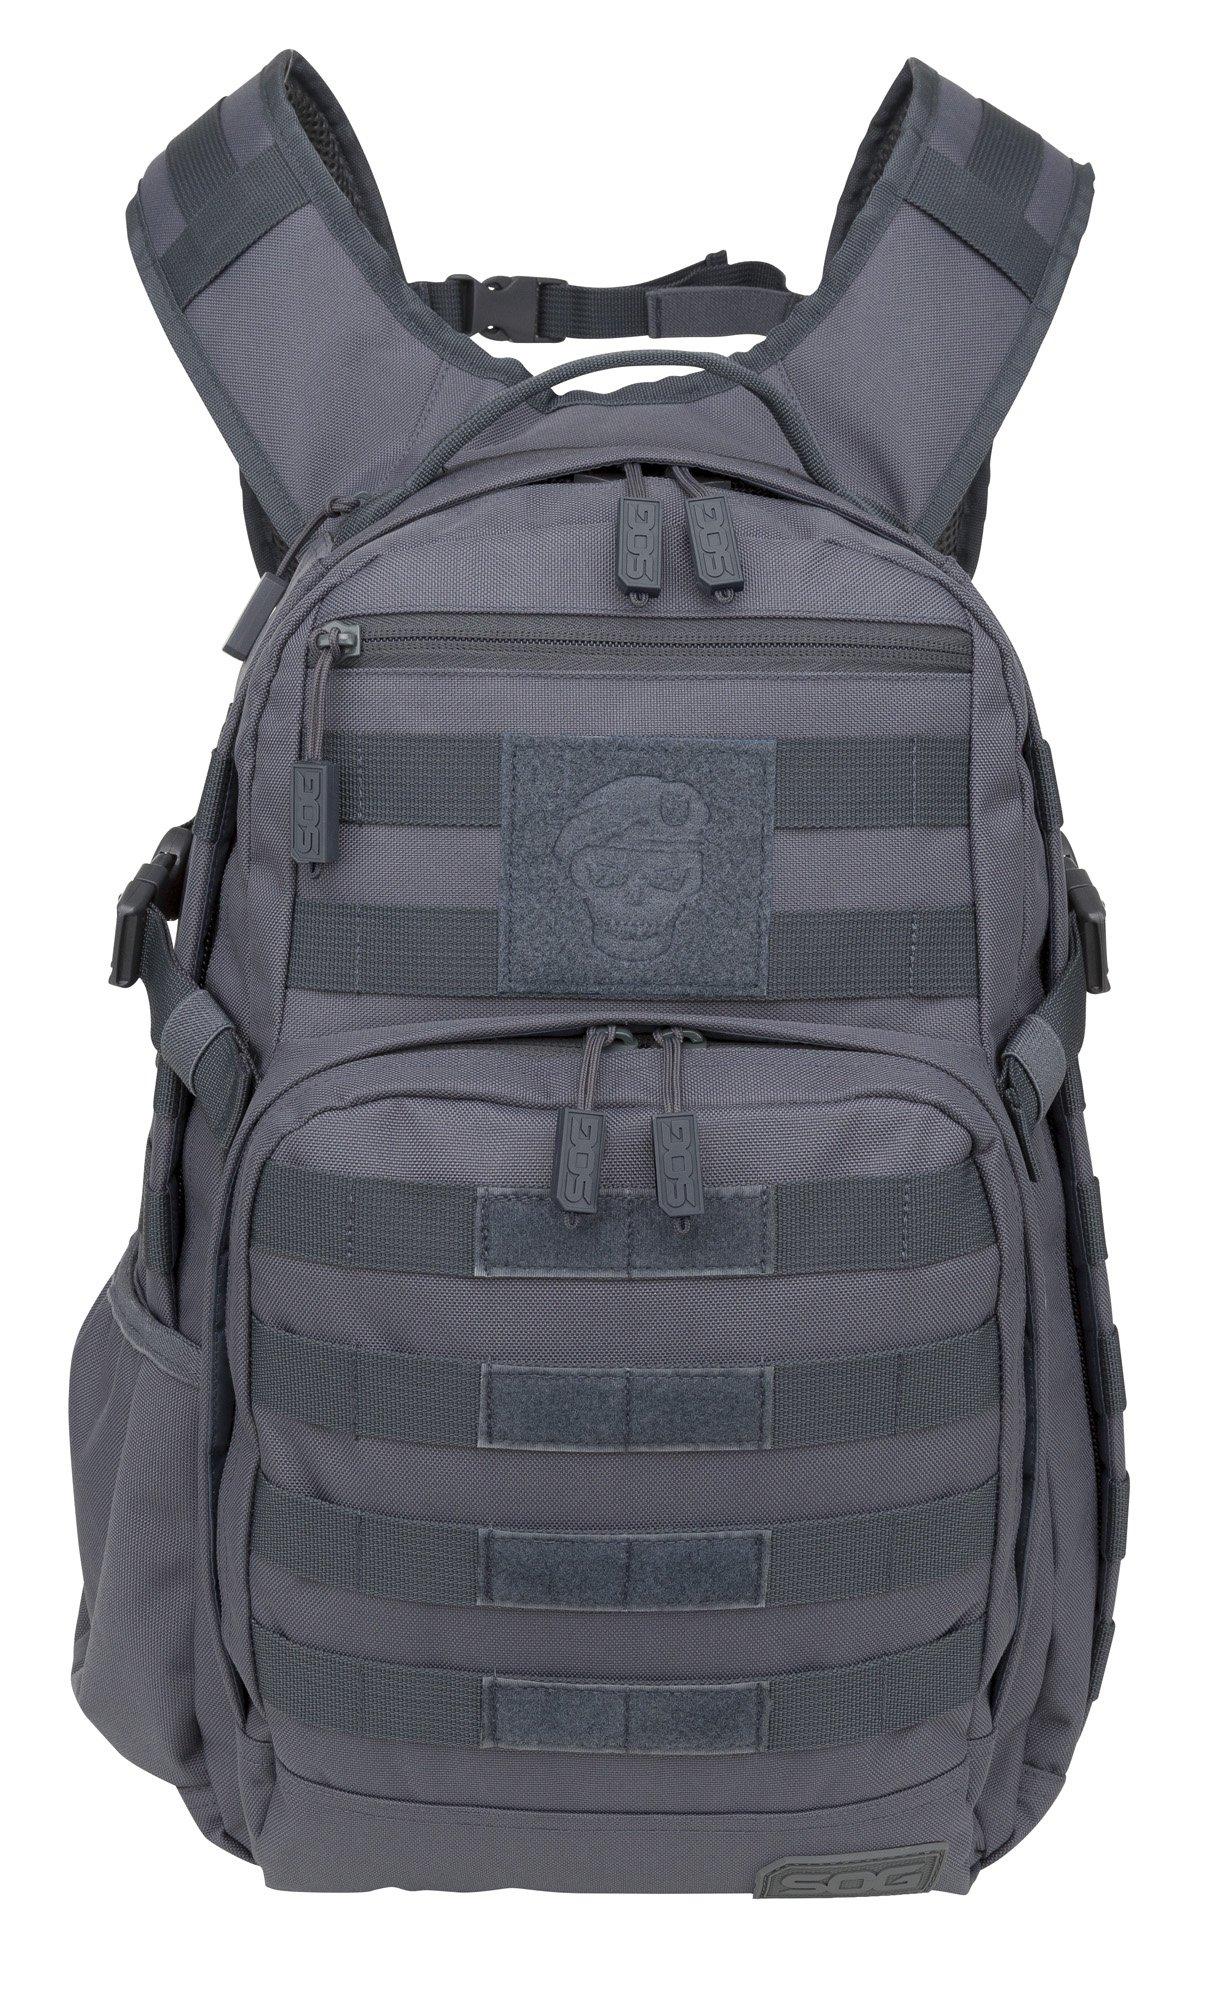 SOG Ninja Tactical Day Pack 24.2-Liter Turbulent